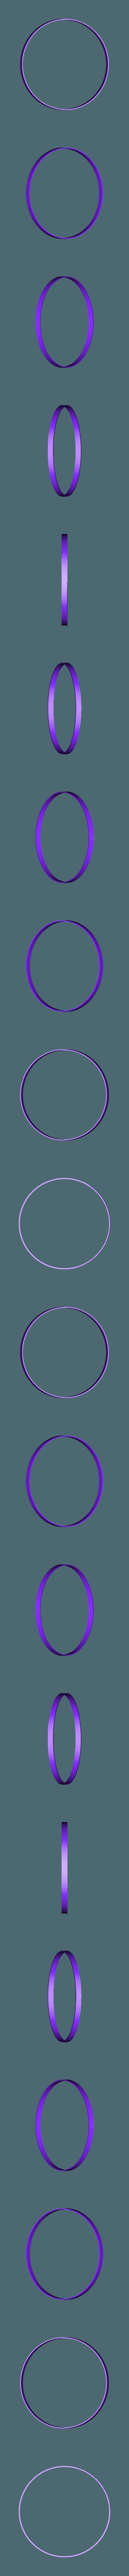 cerclage_acier.stl Download free STL file A spinning wheel • 3D printing template, NOP21